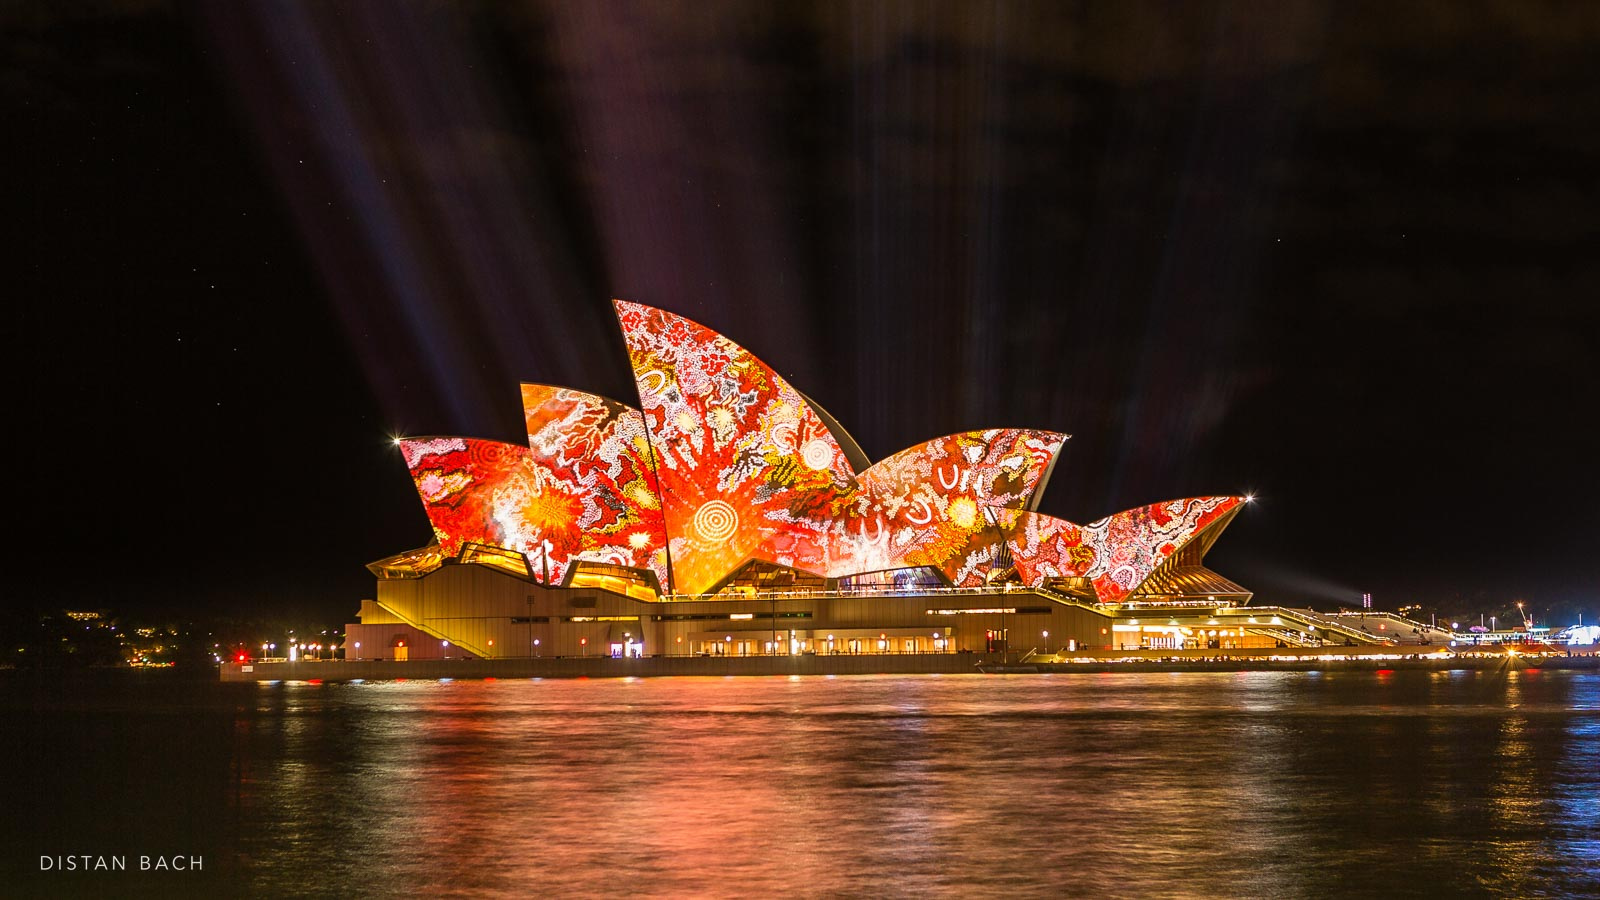 Vivid Light Festival Sydney Opera House Distan Bach